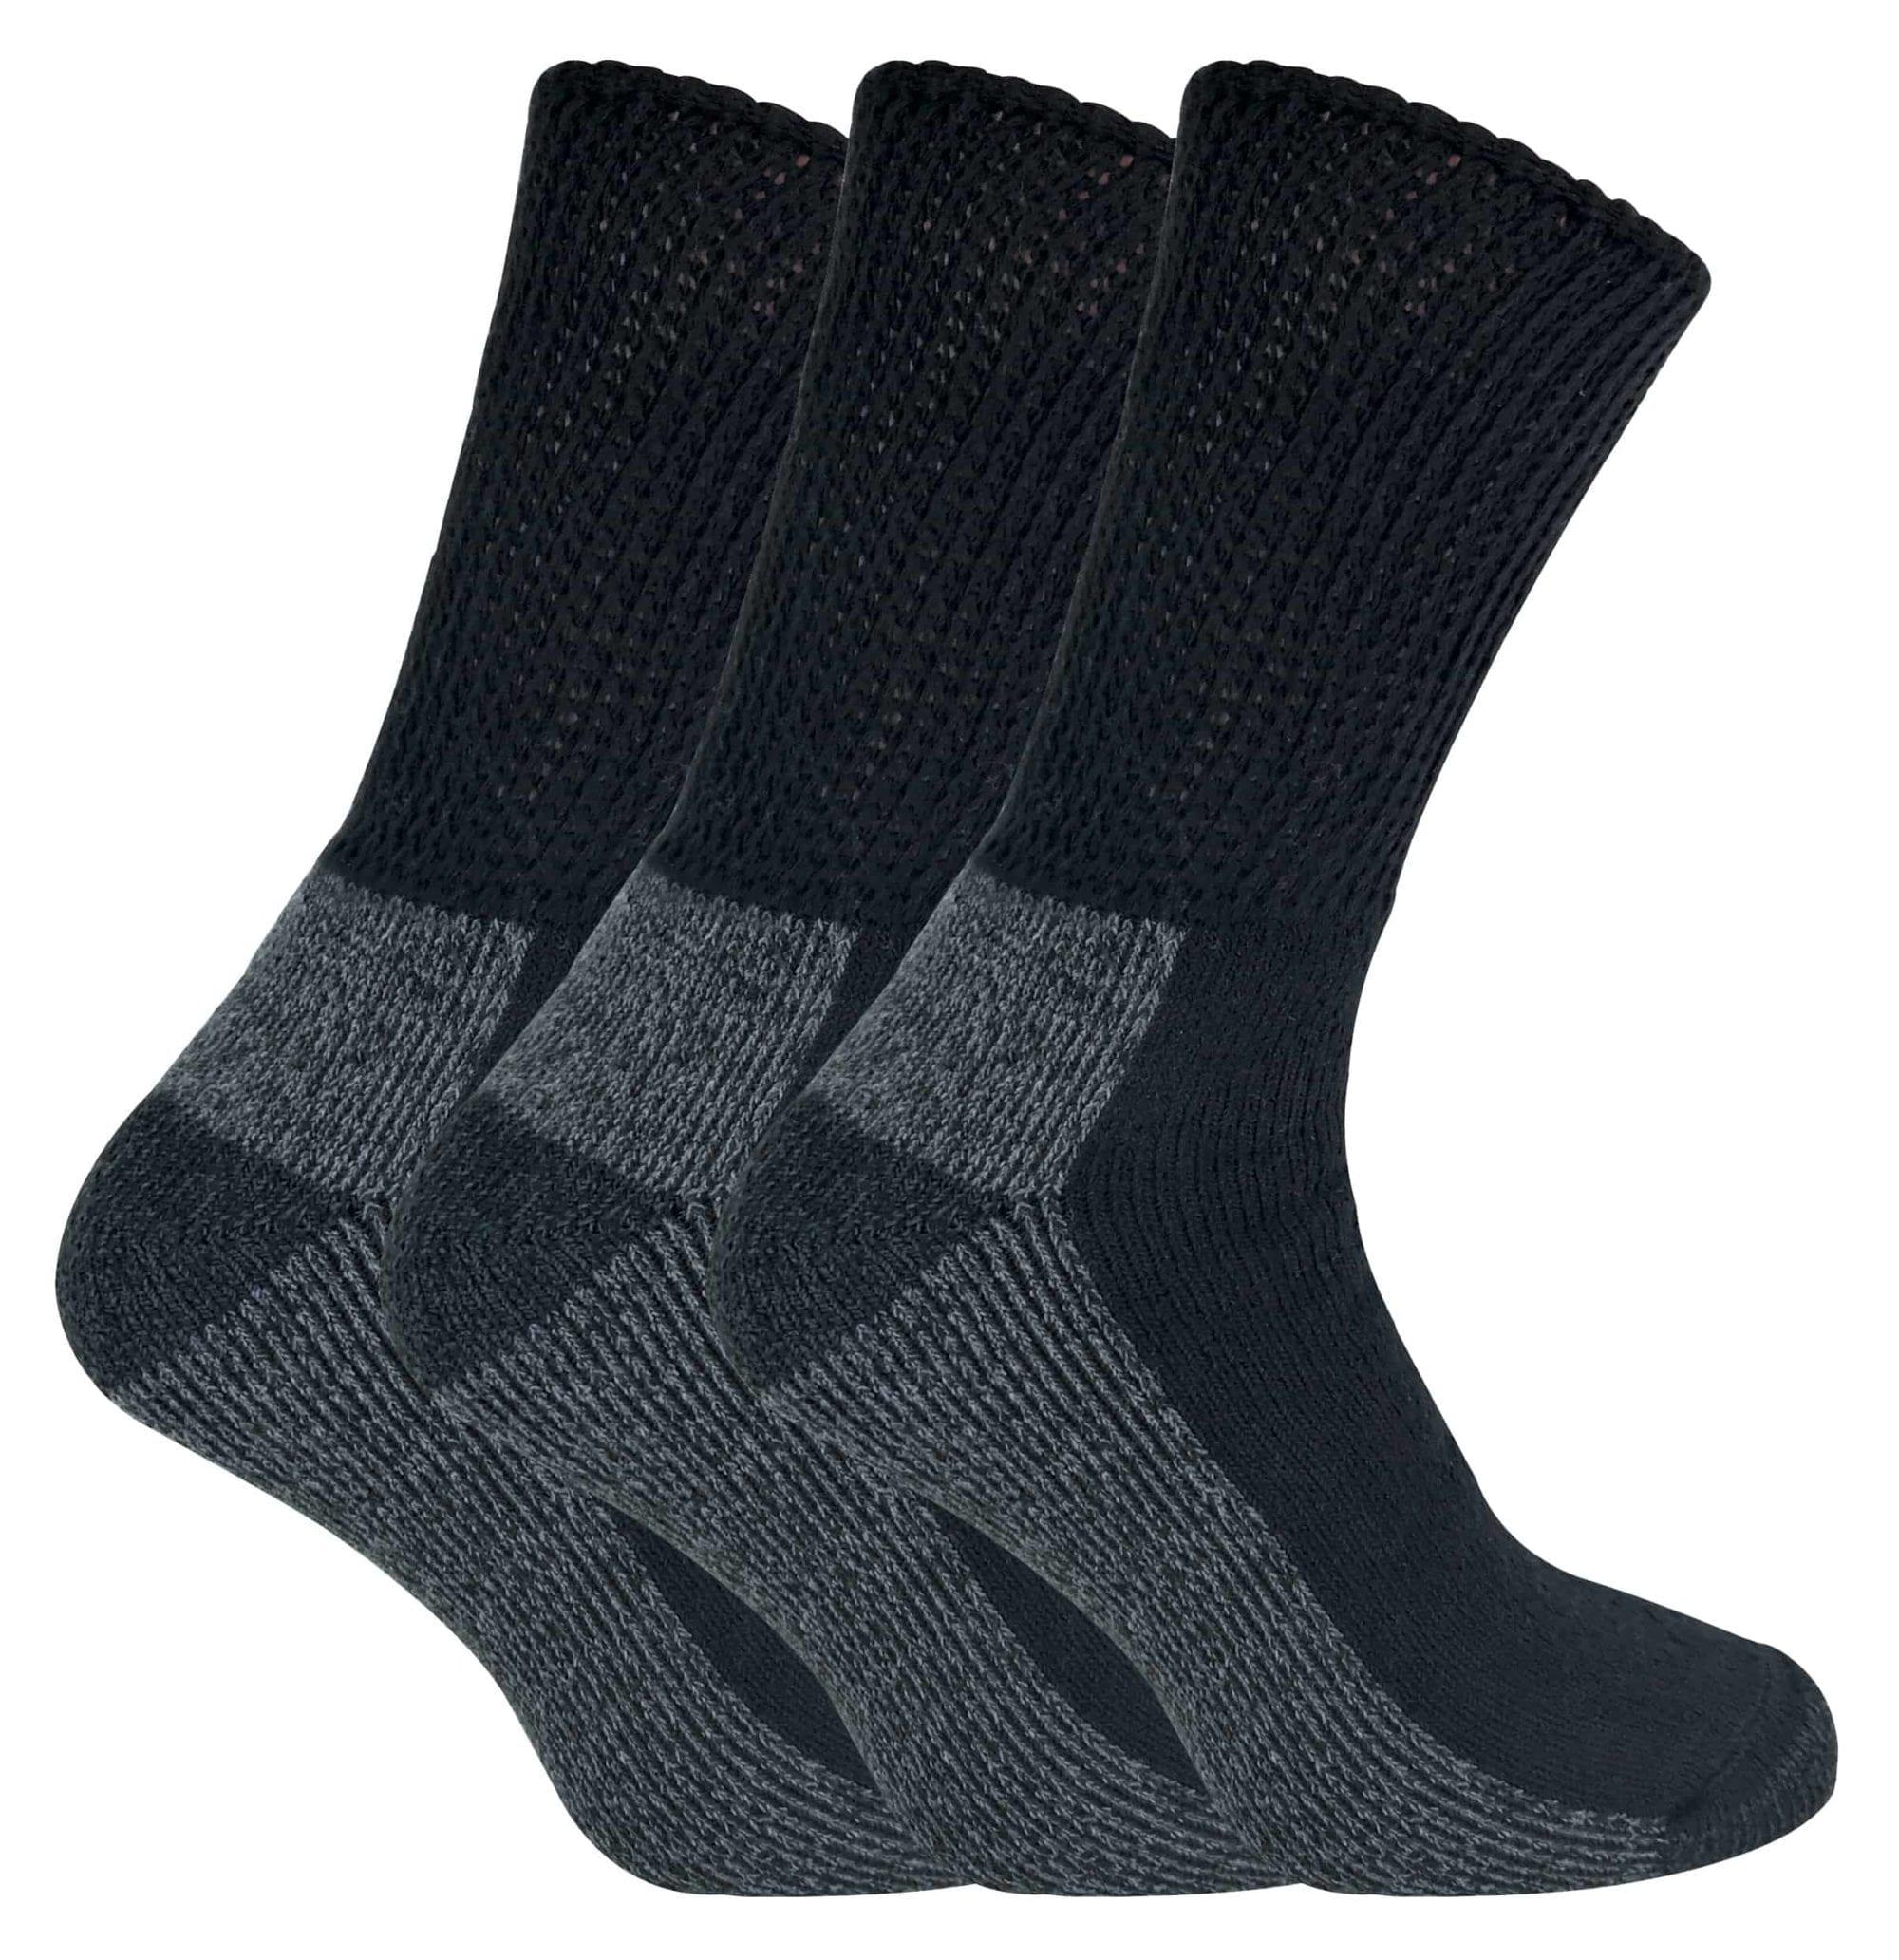 3 PAIRS LADIES OR MENS   LOOSE TOP COTTON SOCKS  FOR SWOLLEN ANKLES DIABETICS